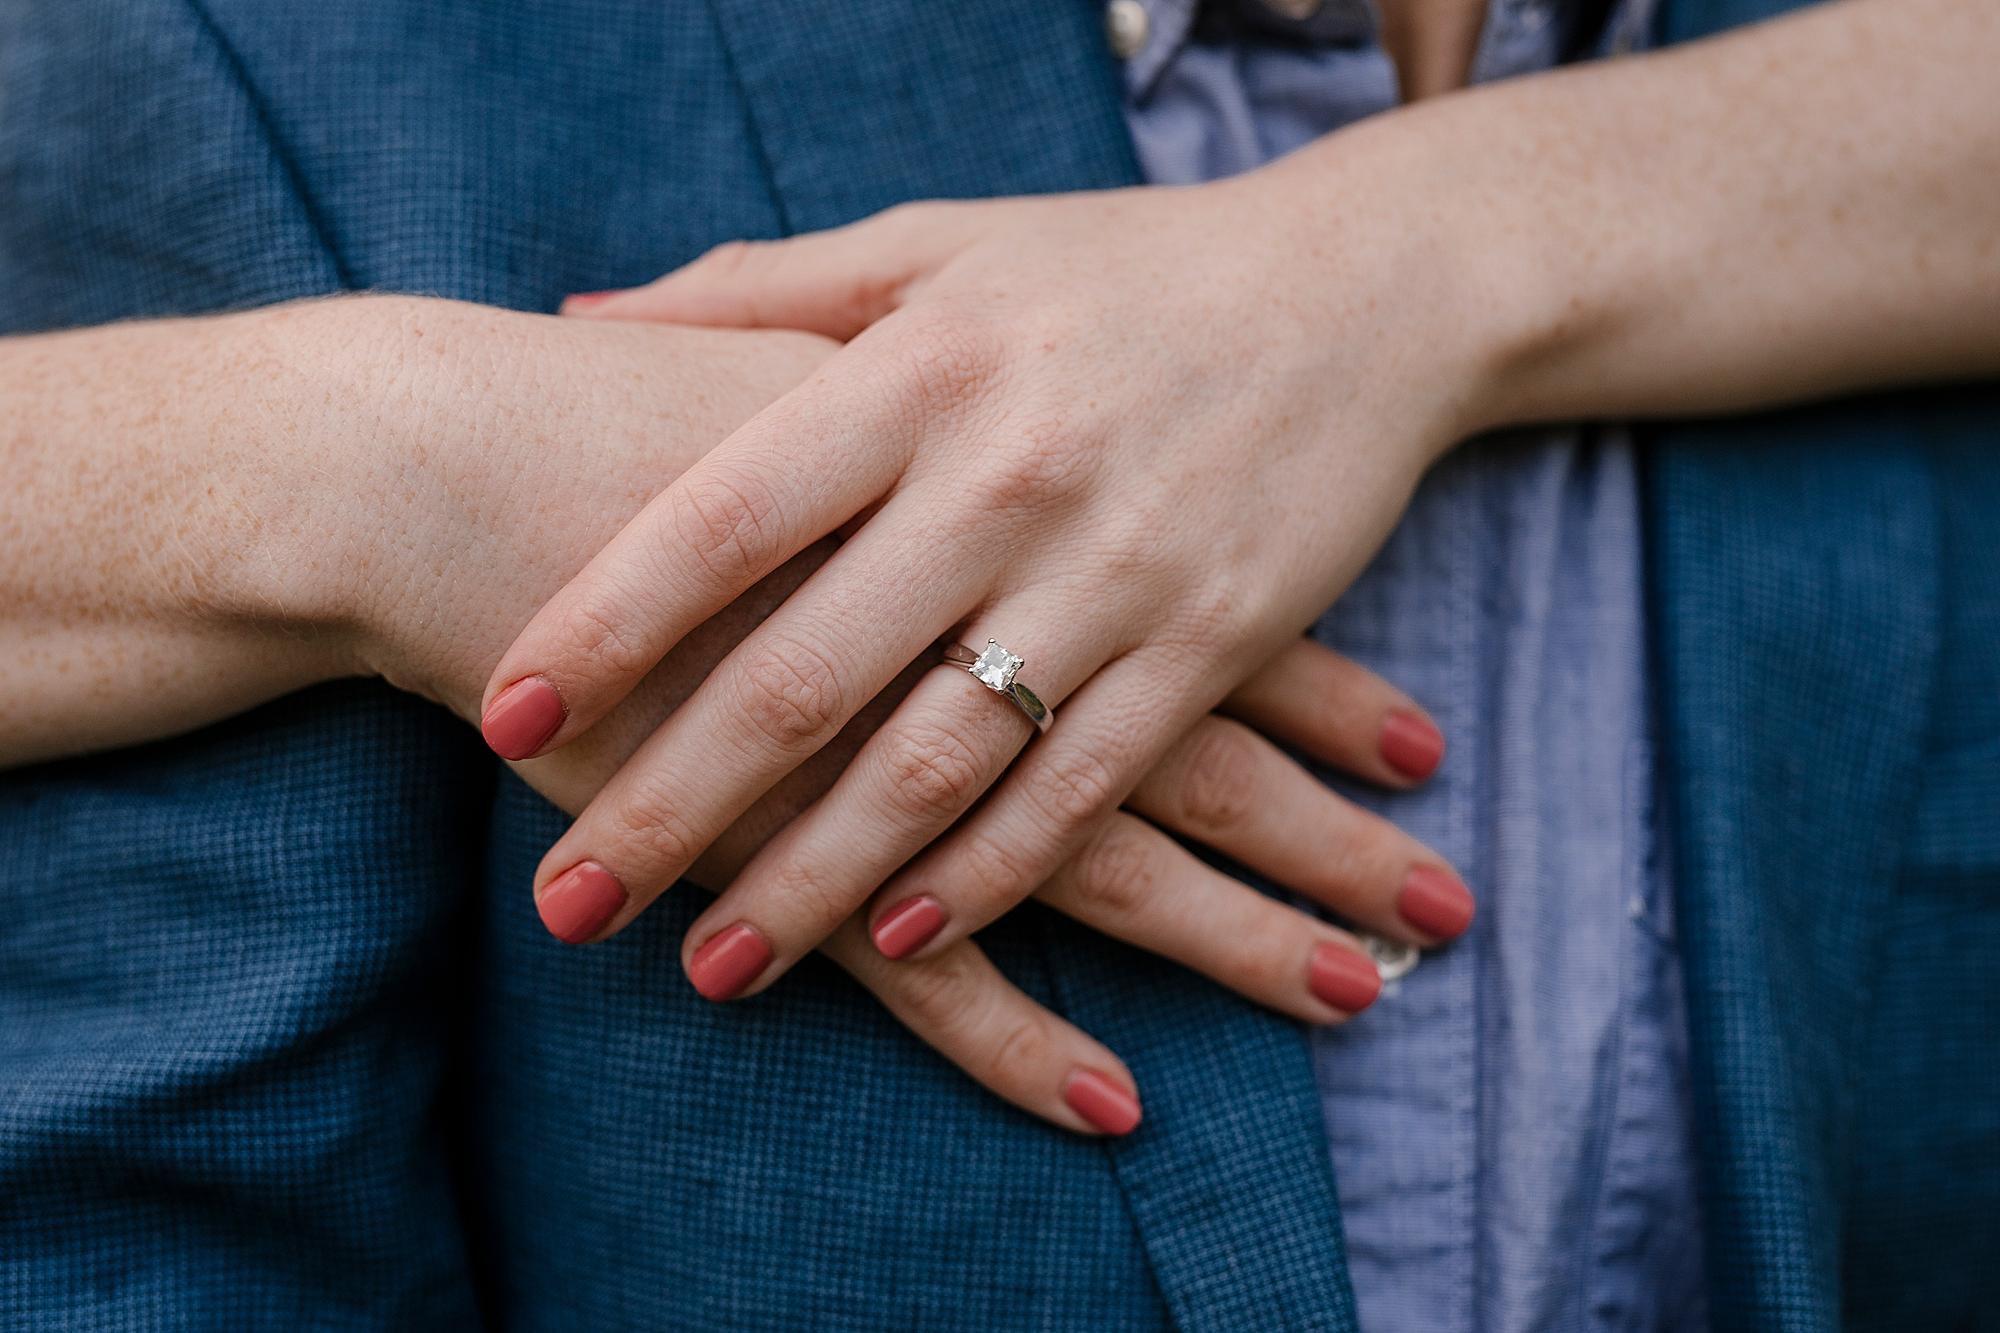 Tori_Zack_Glen_Mills_Terrain Cafe_Wedding_Engagement_Photography_Joe_Mac_Creative__0039.jpg